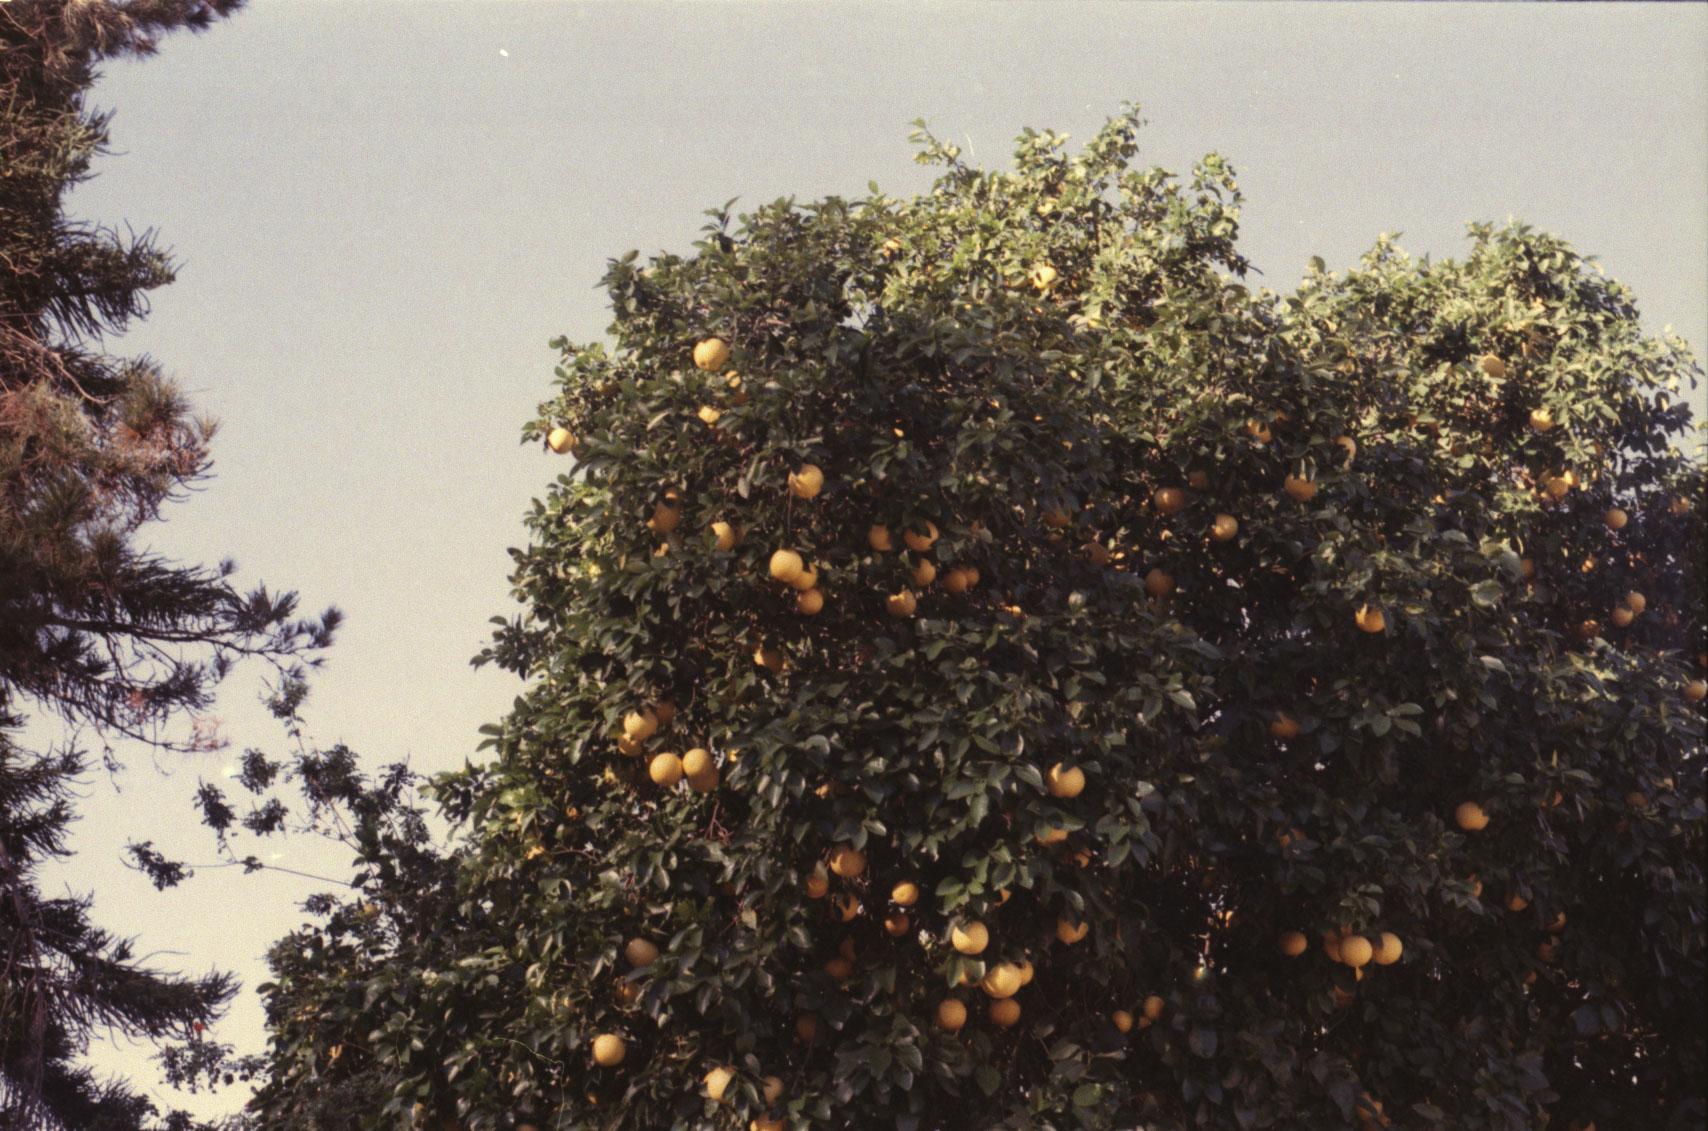 Our friend's grapefruit tree